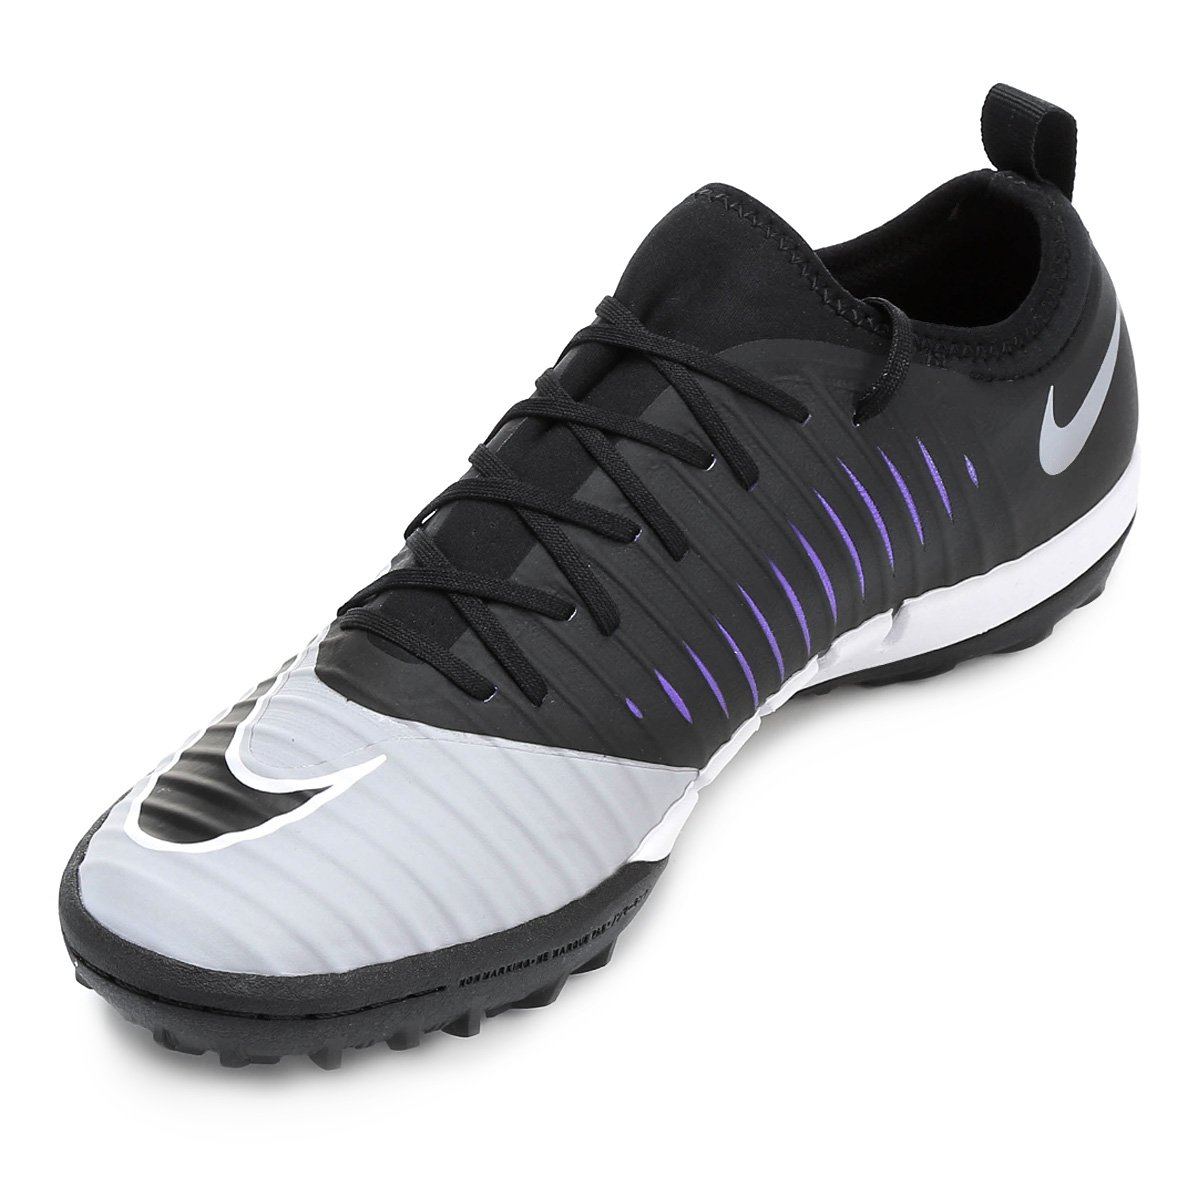 282429212e Chuteira Society Nike Mercurial Finale 2 TF - Preto e Cinza - Compre ...